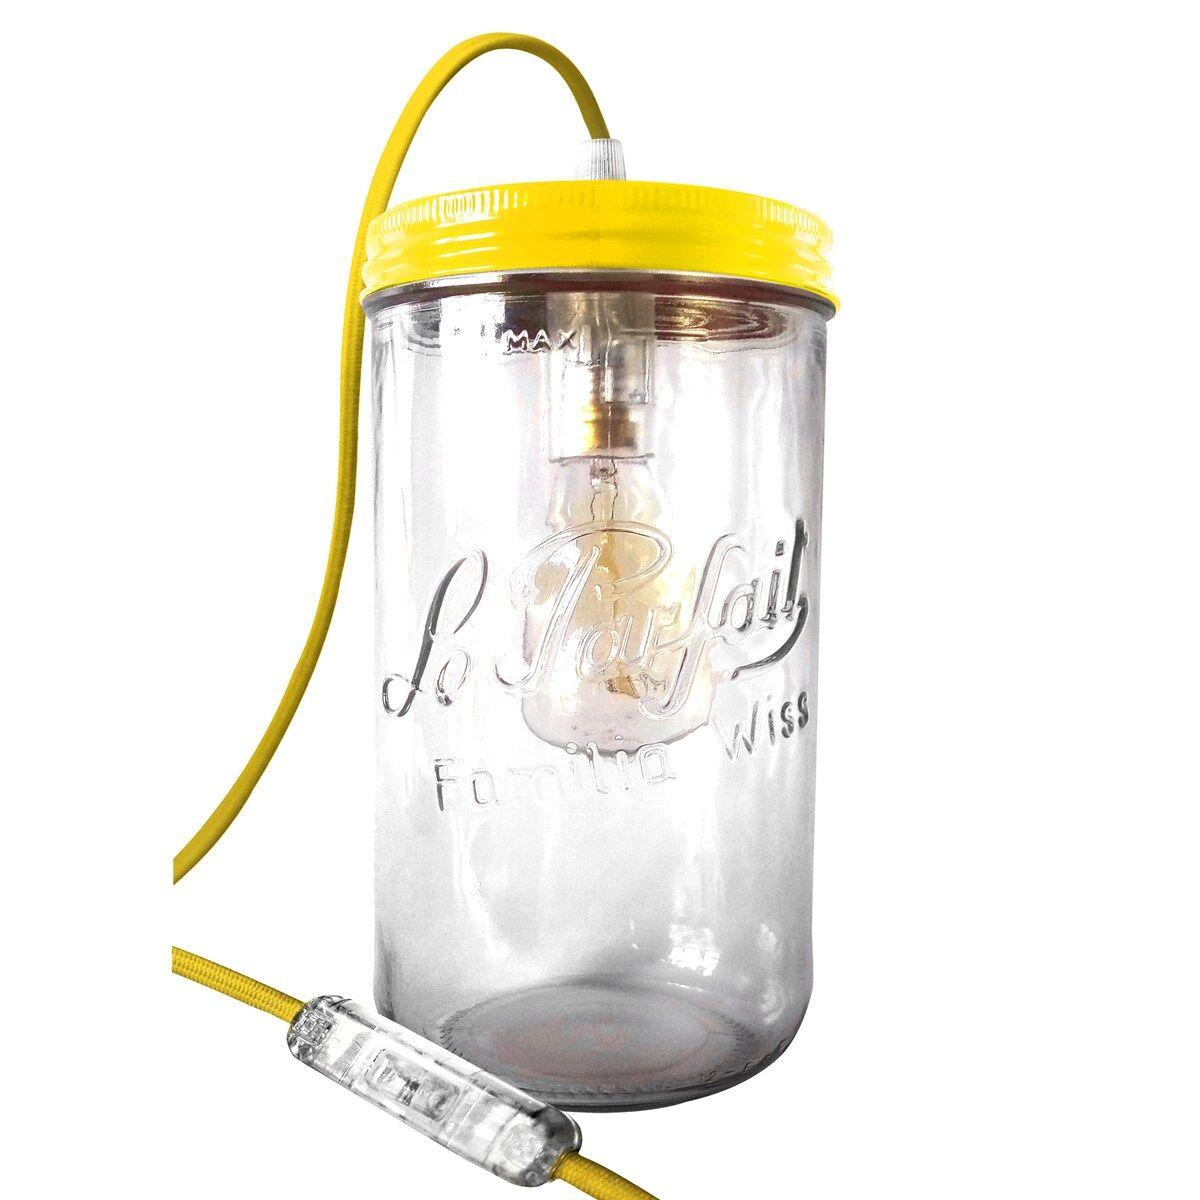 Fenel & Arno Lampe bocal XL en verre jaune